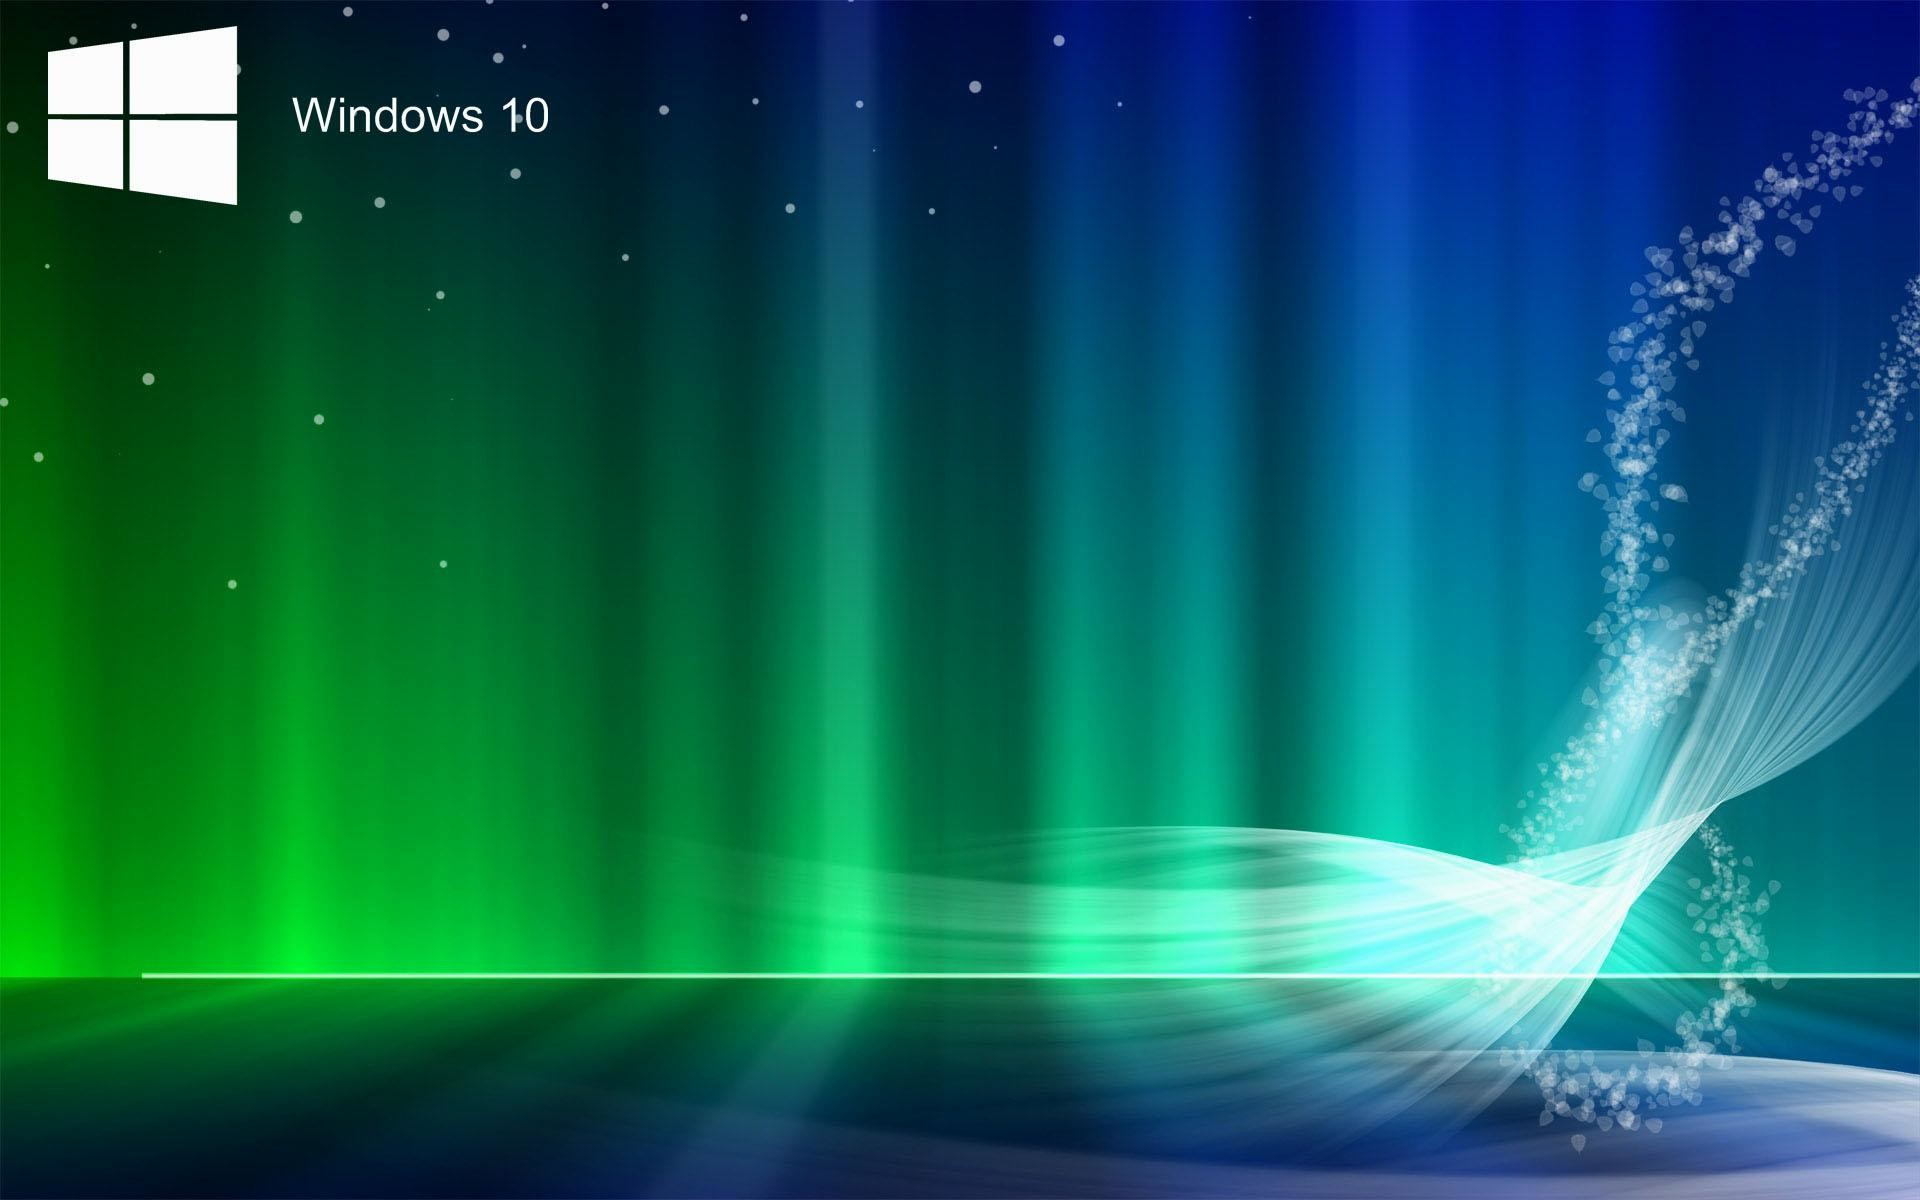 2560x1600 Windows 10 Wallpapers